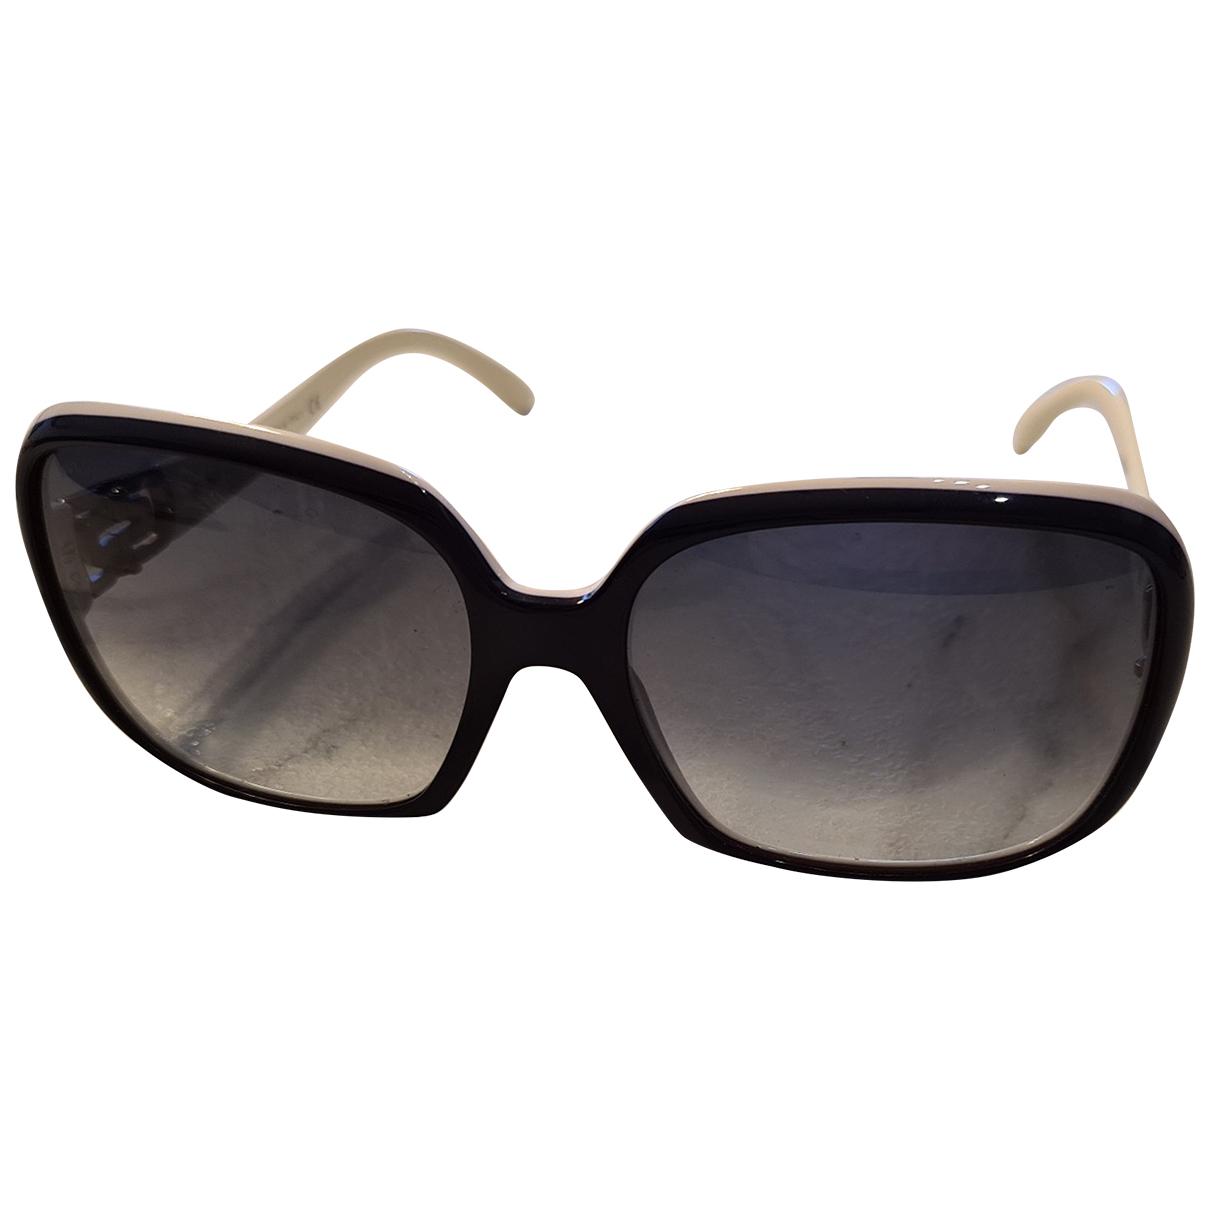 Bvlgari N Sunglasses for Women N